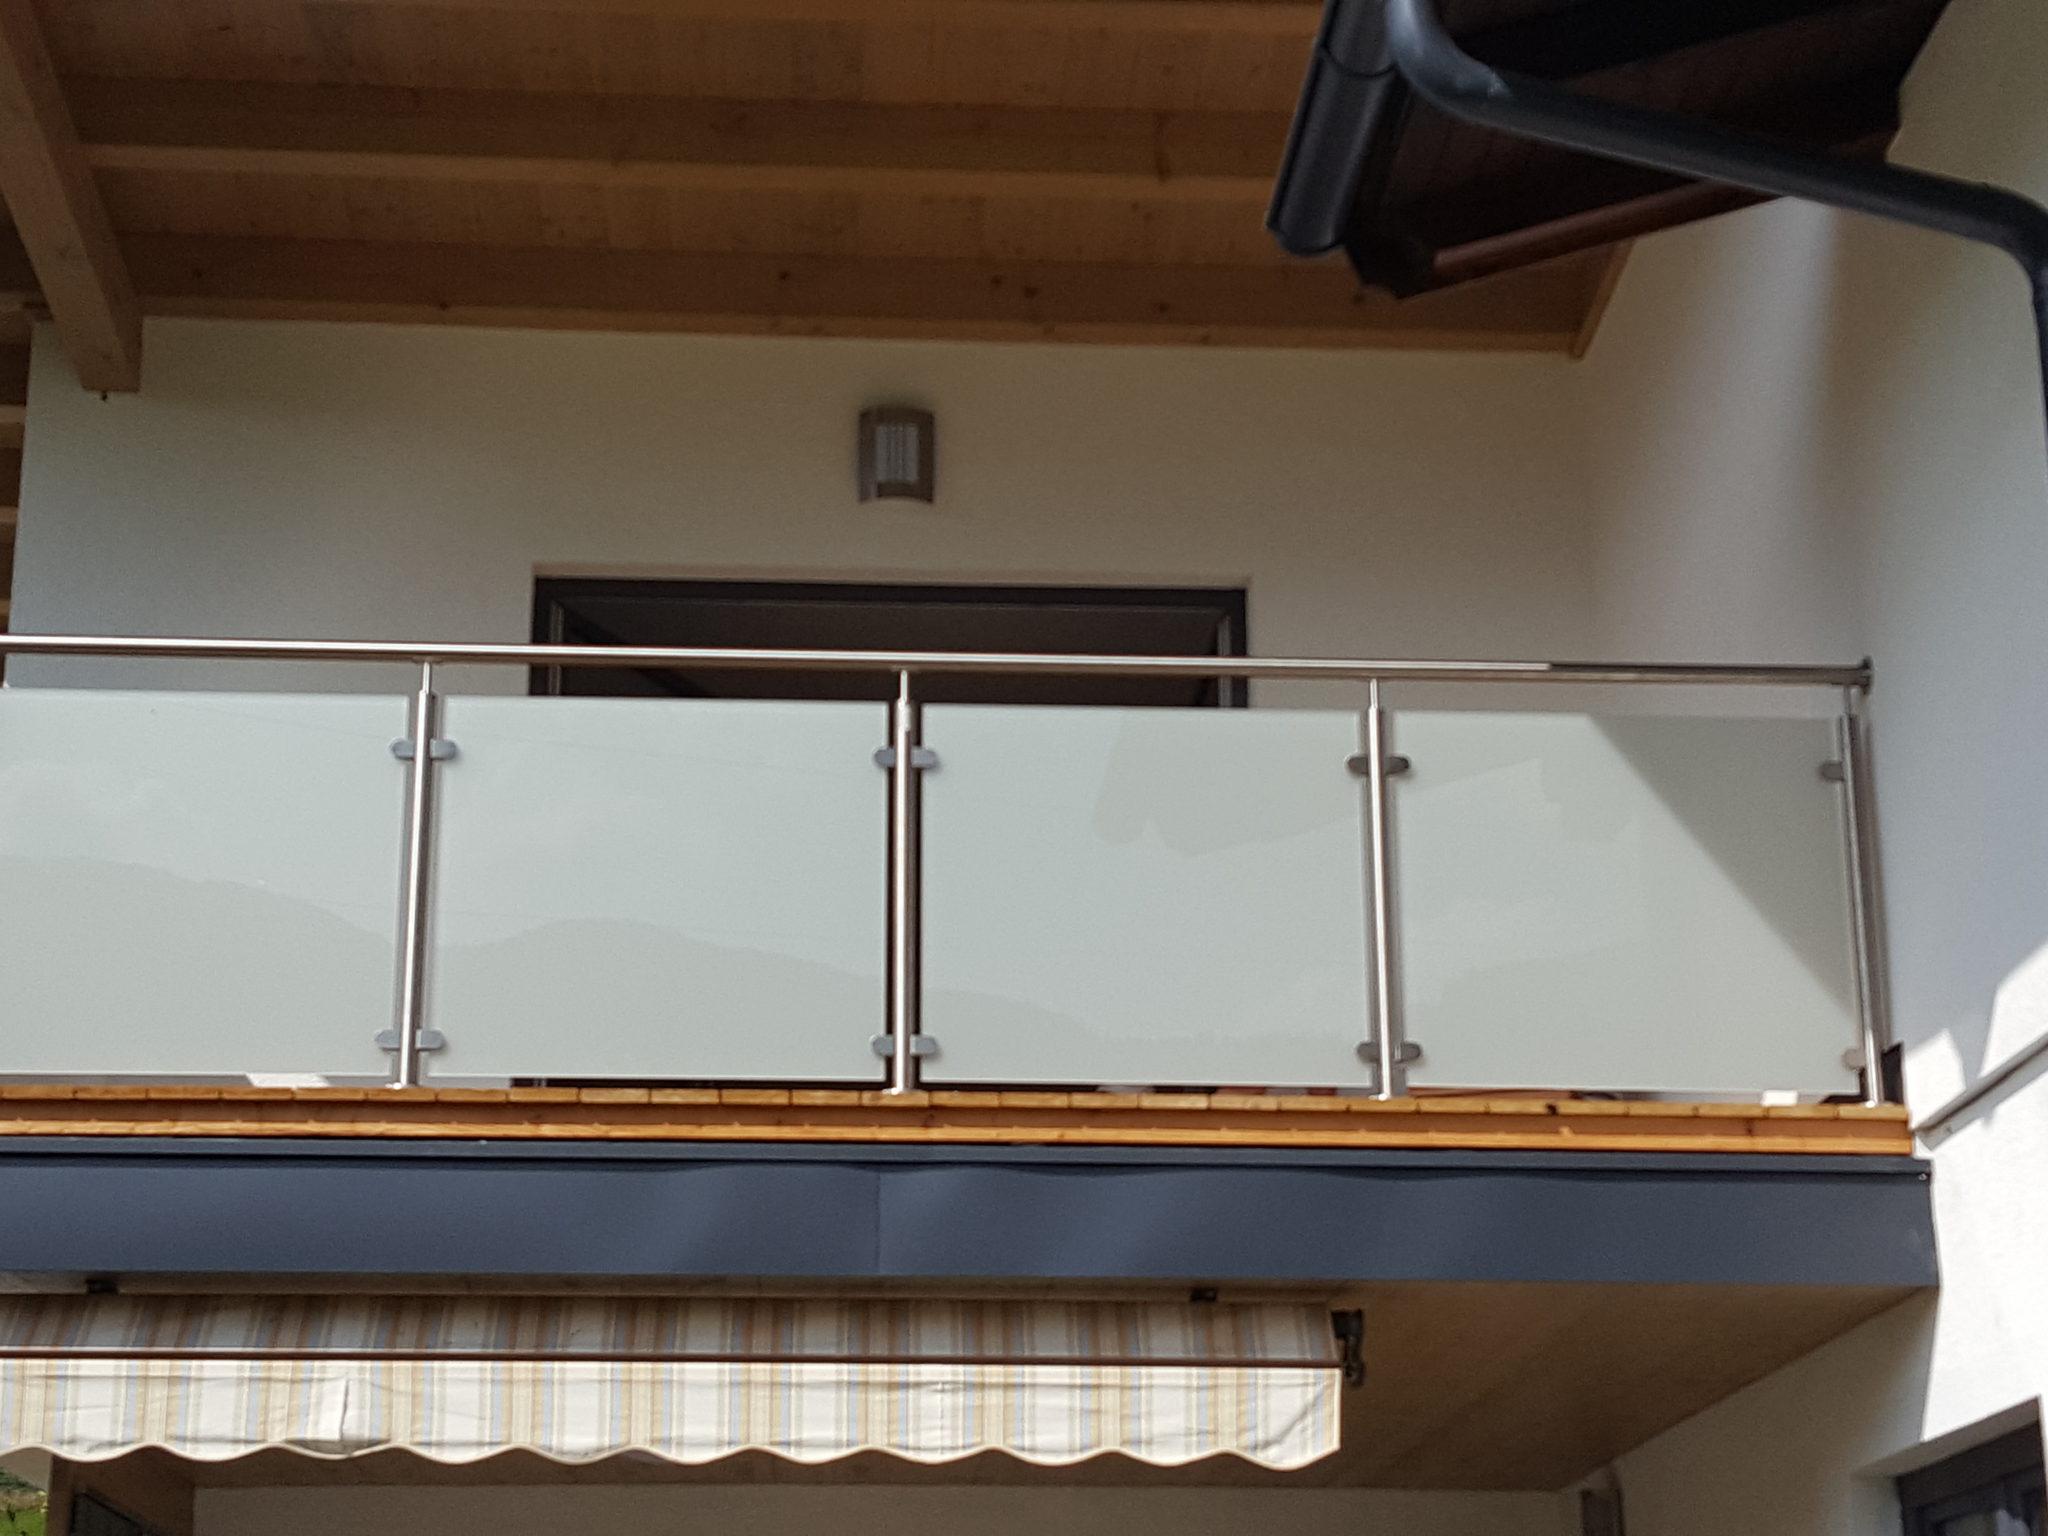 balkongel nder mit glas sofortige preisanzeige. Black Bedroom Furniture Sets. Home Design Ideas